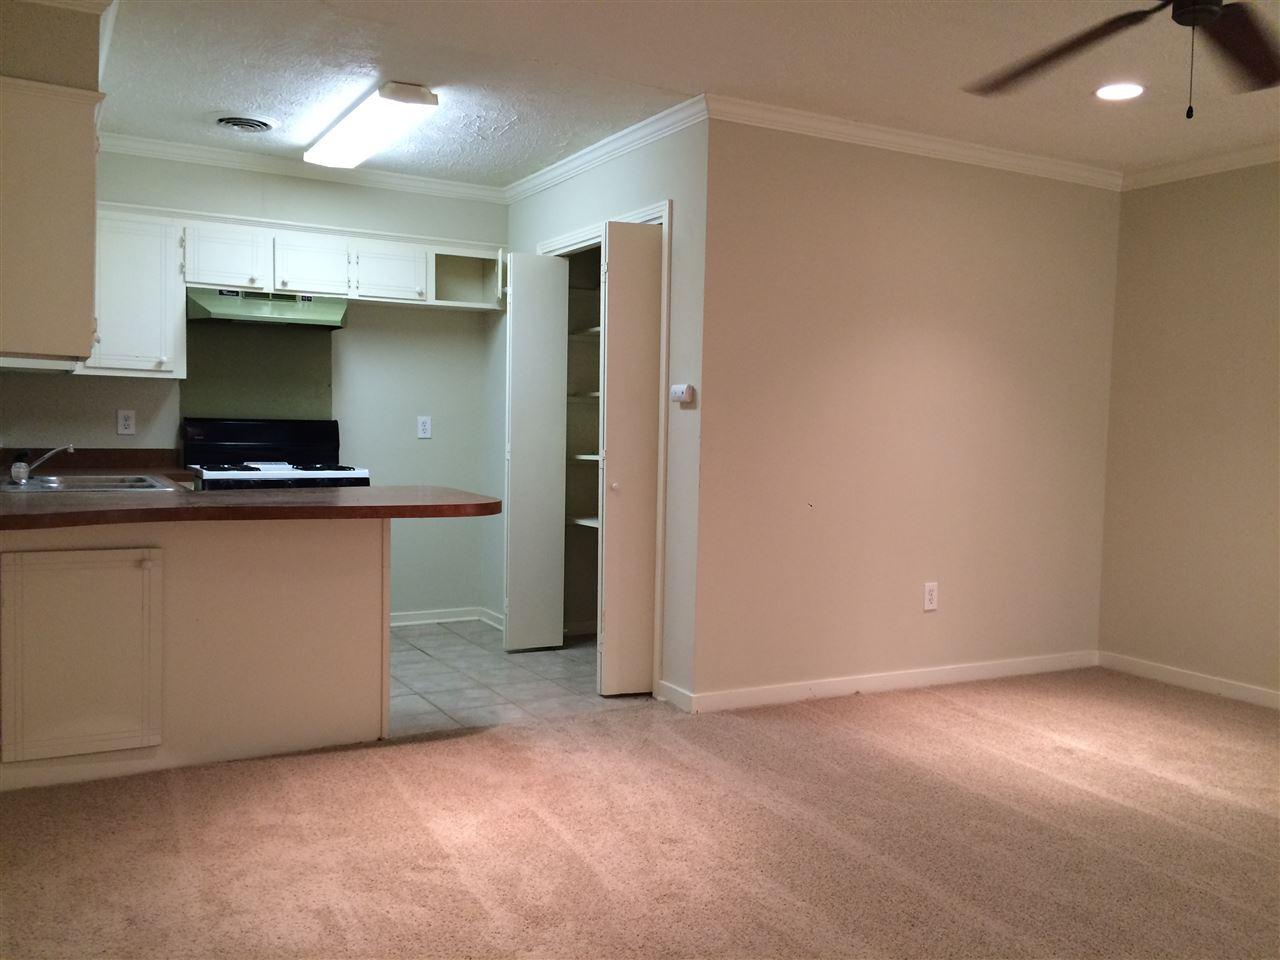 Rental Homes for Rent, ListingId:35236235, location: 1436 B KIMWOOD DR Jackson 39211